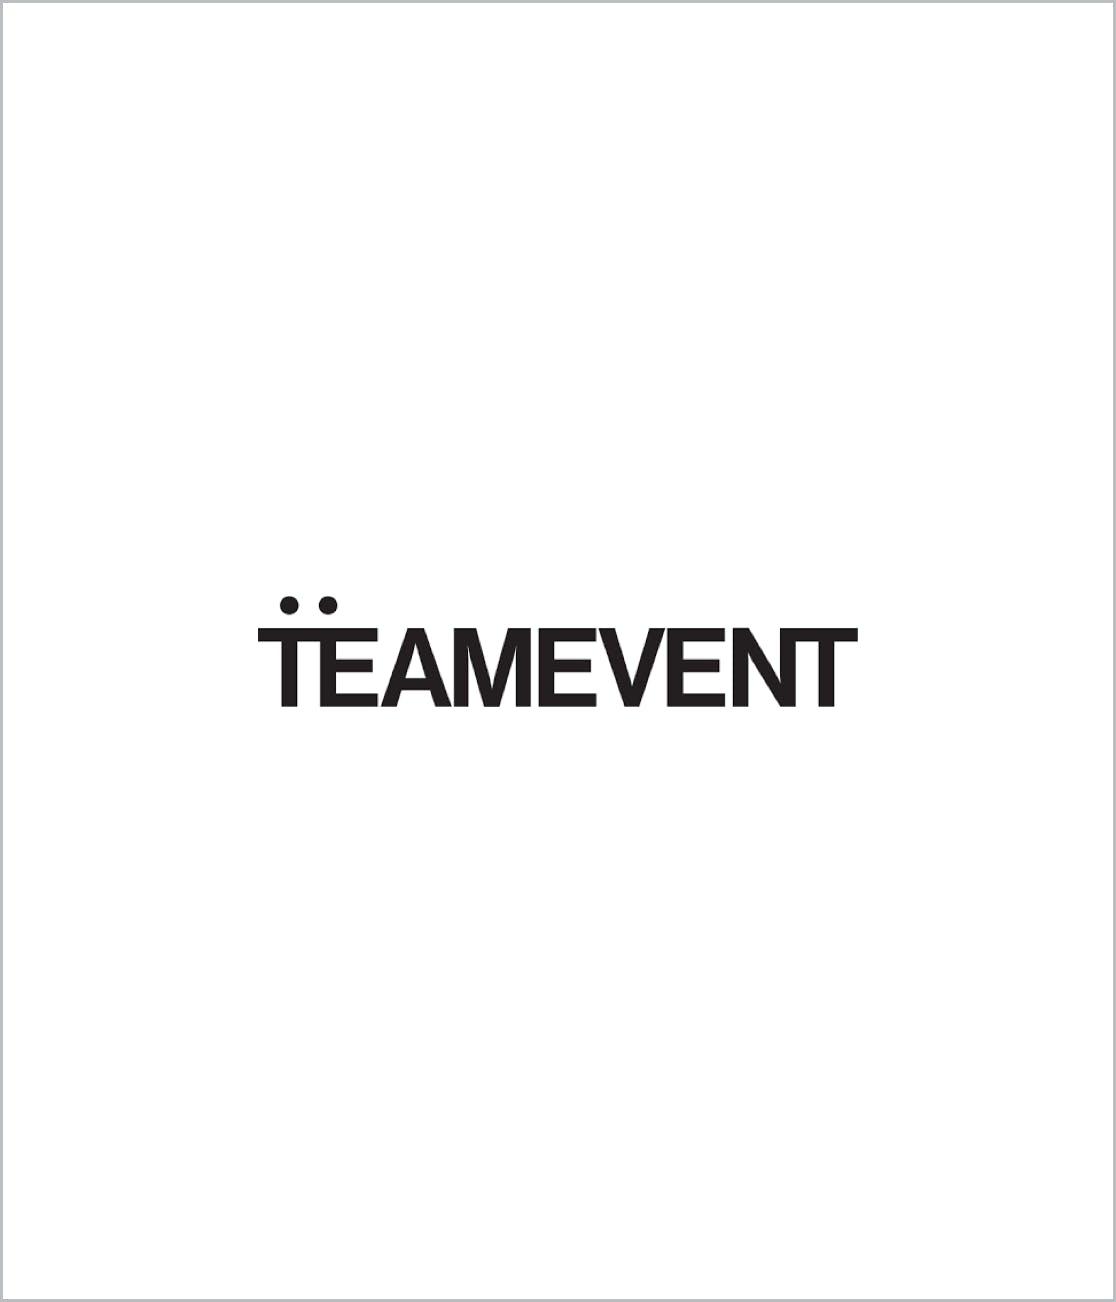 Teamevent Logo Supplier